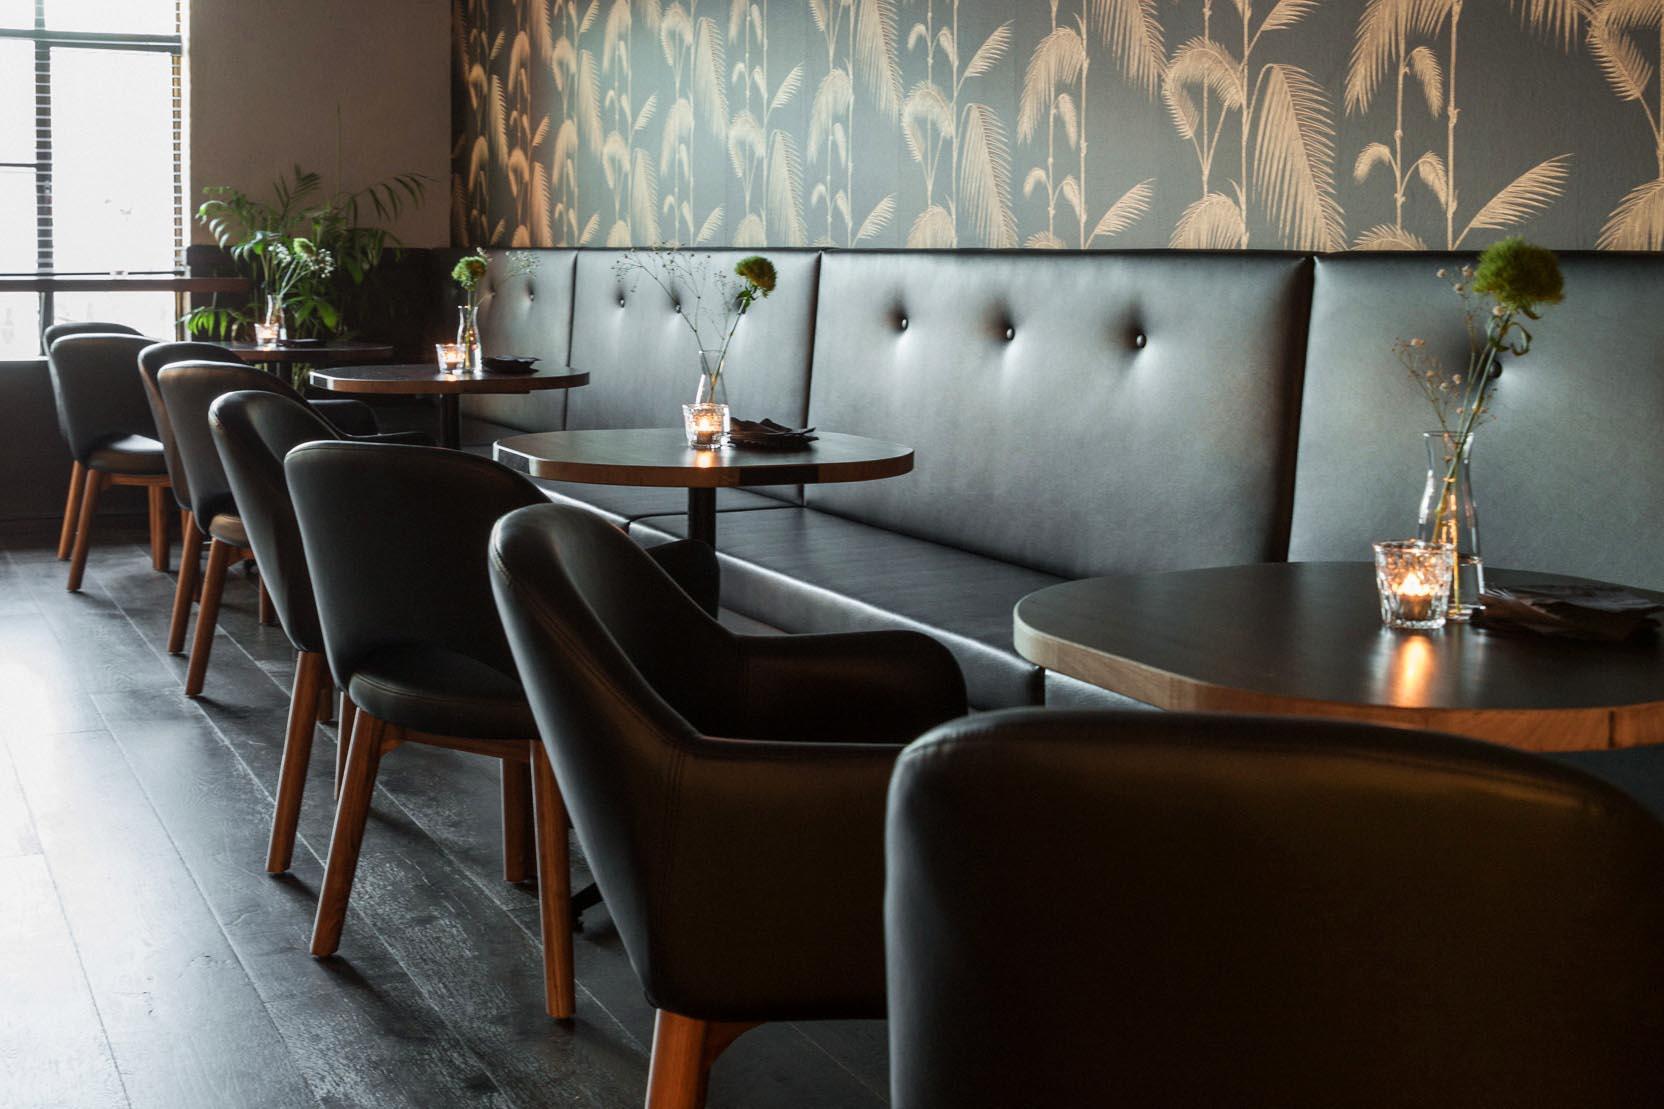 Neptune-Restaurant-Windsor-Prahran-Restaurants-Melbourne-Dining-Best-Top-Good-Cool-Private-Dining-Food-005.jpg